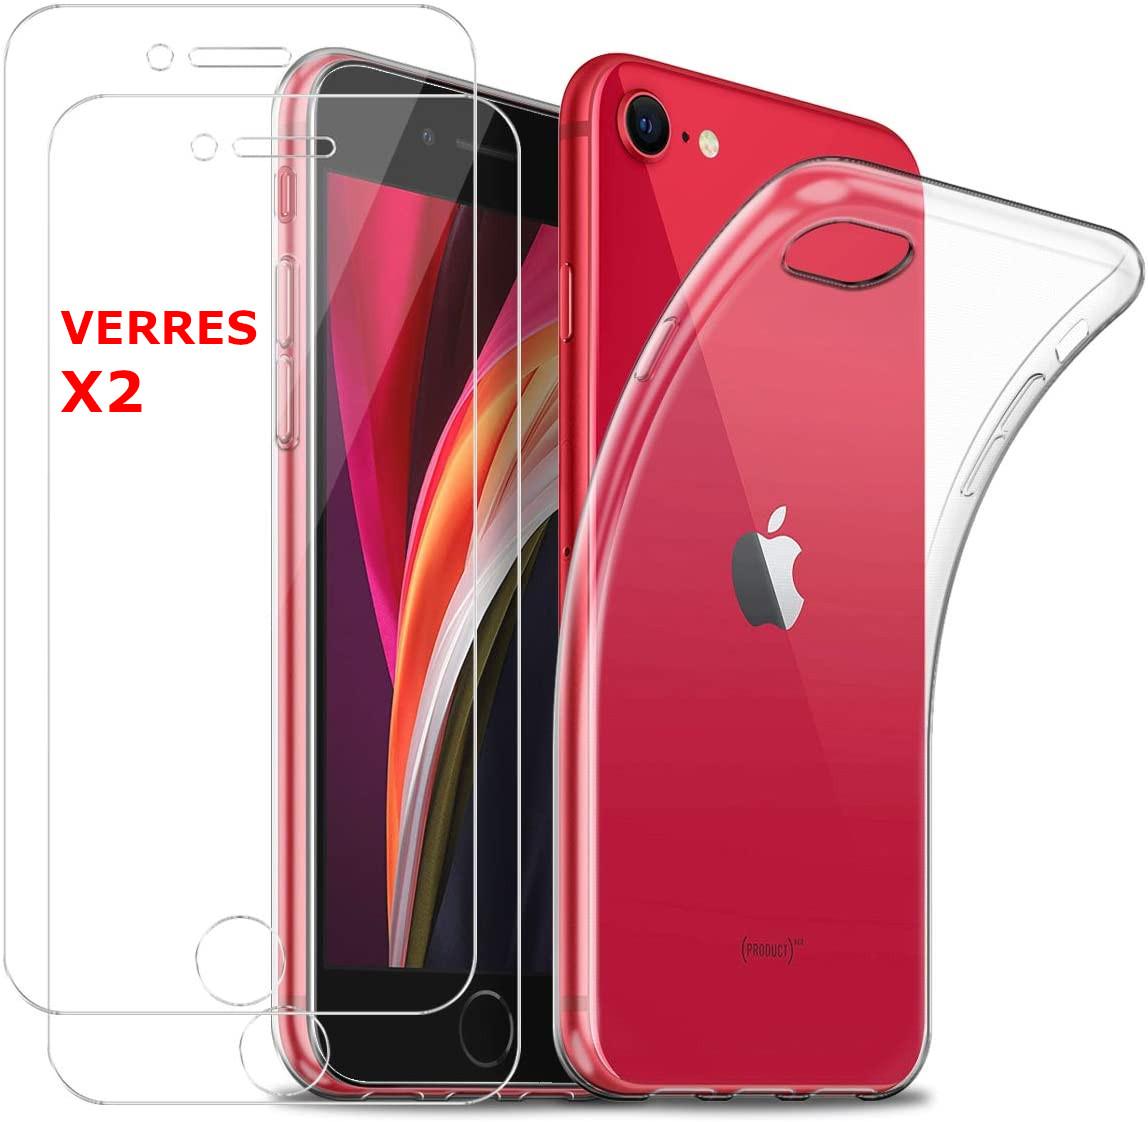 Coque Silicone Transparente Pour iPhone 7 Plus / 8 Plus + 2 Verres Trempe - Little Boutik®